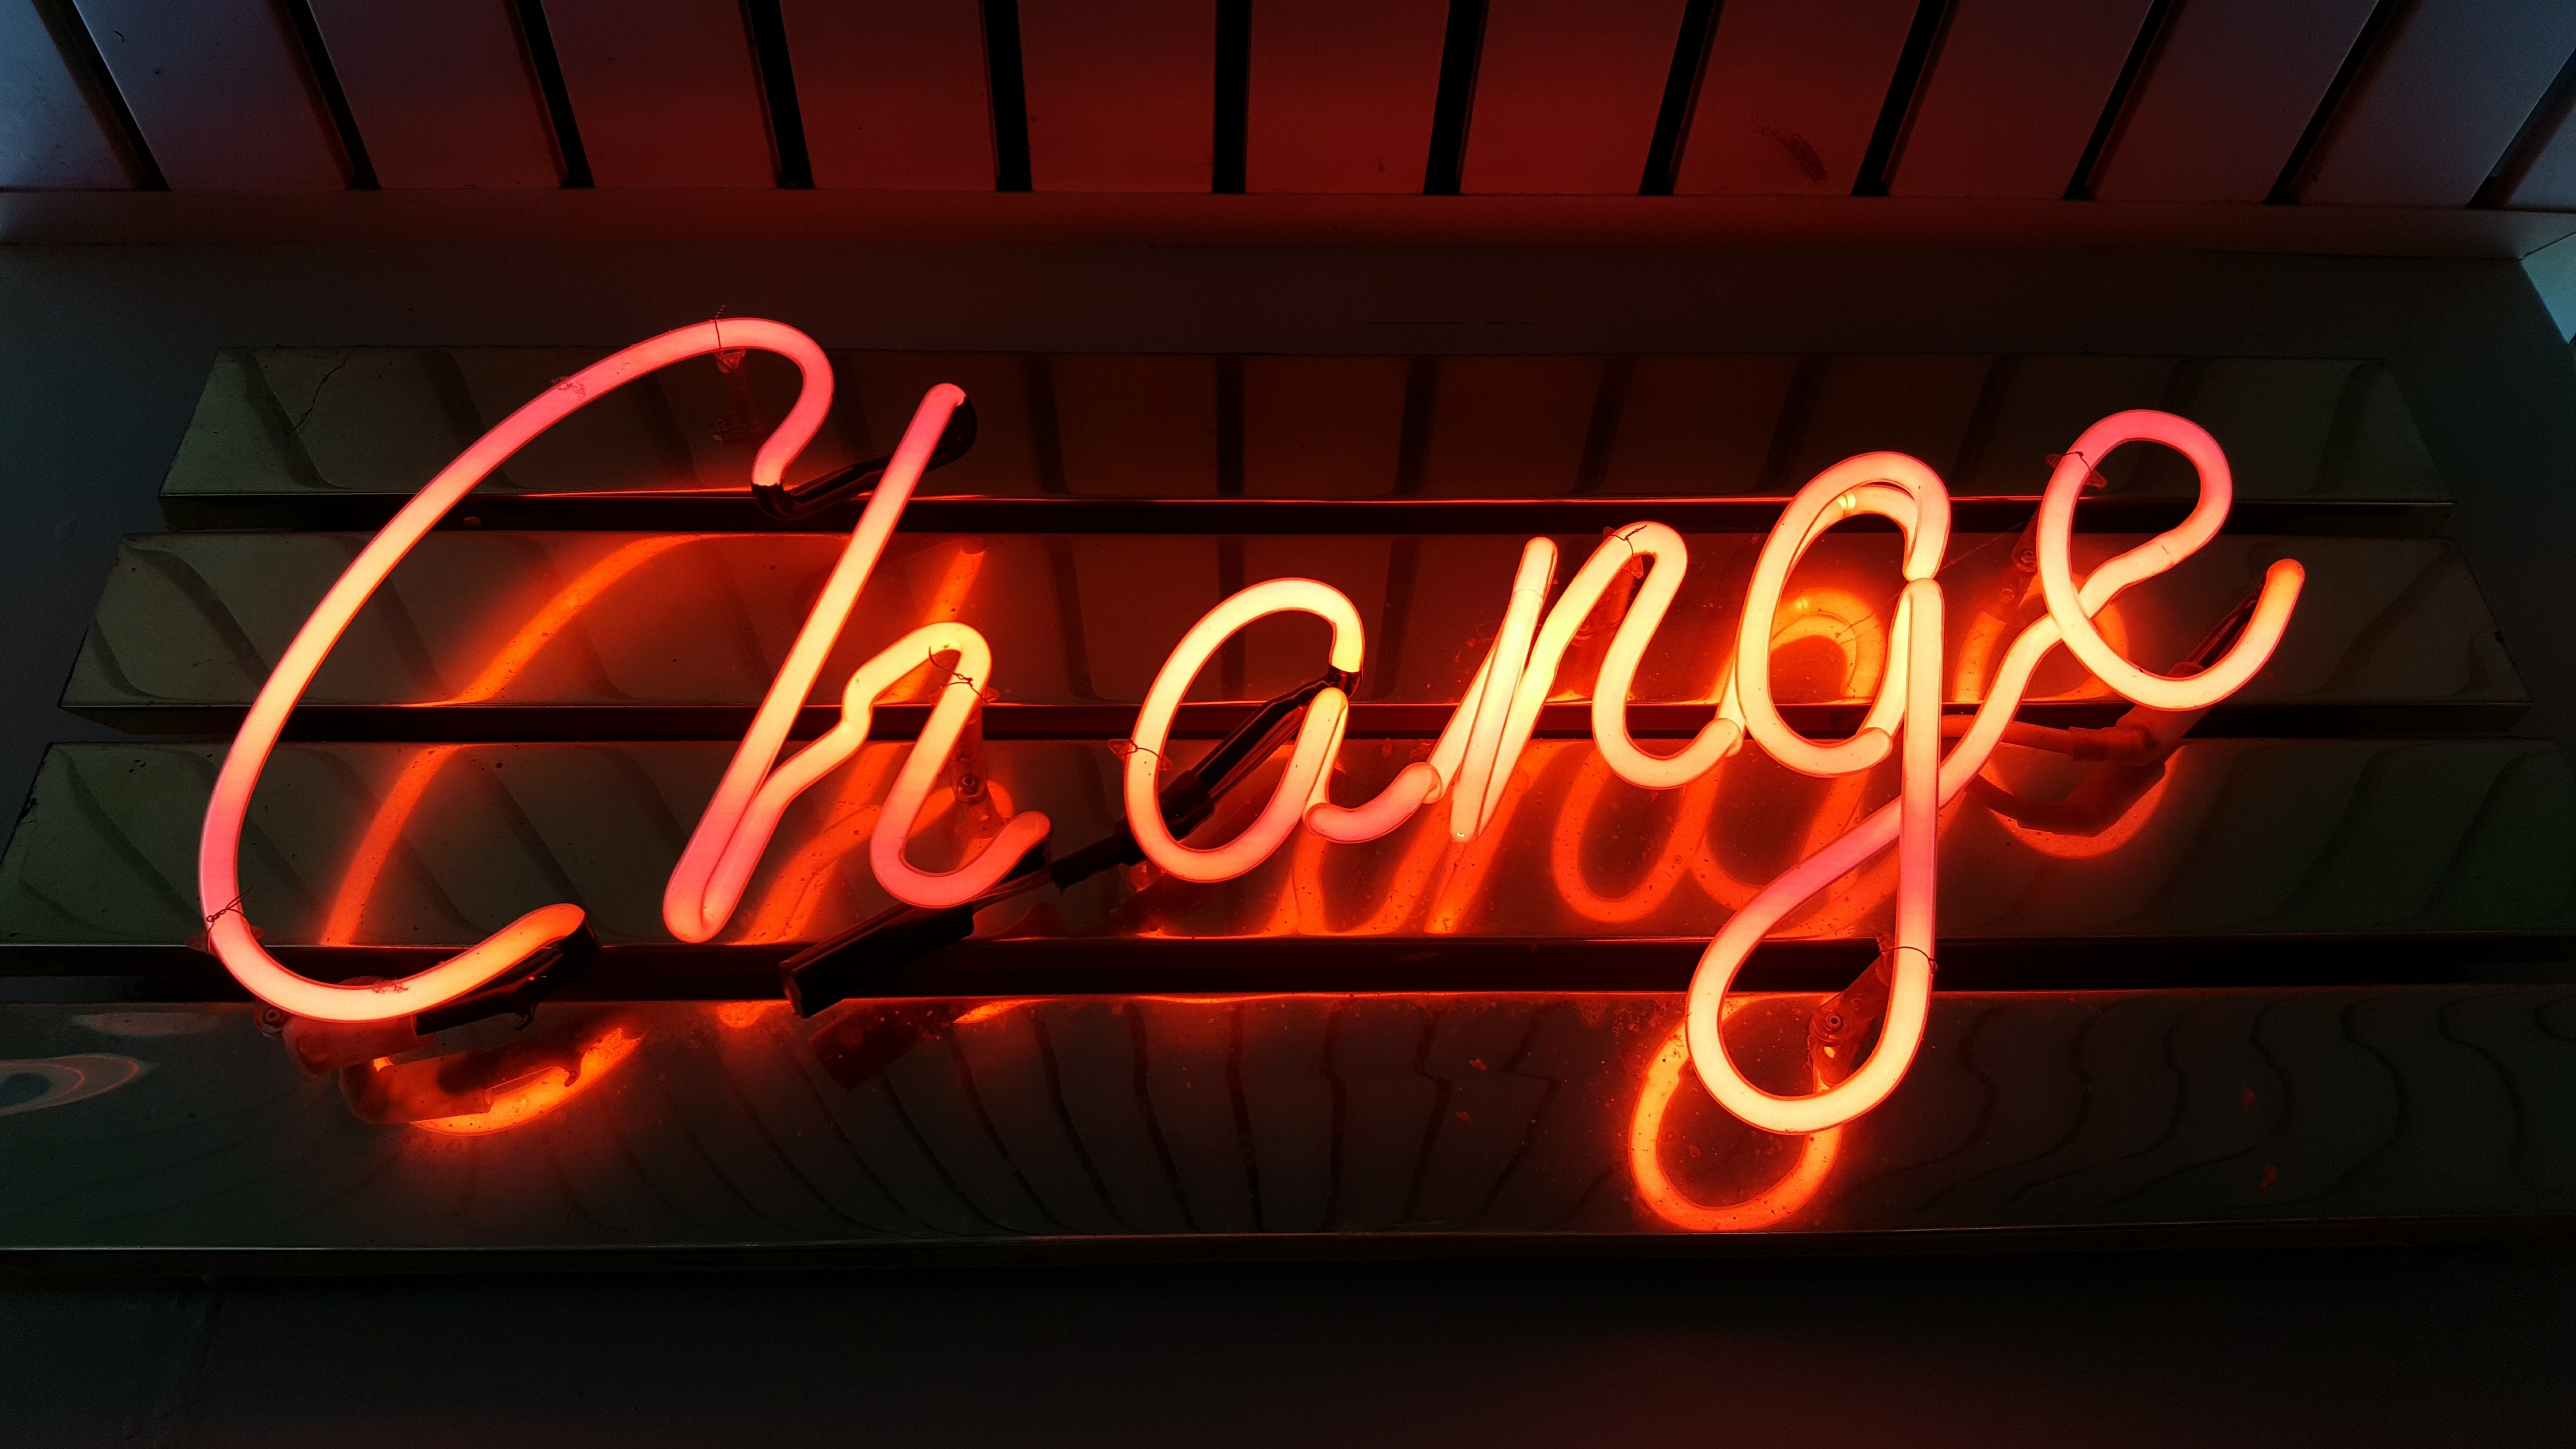 Digitale transformatie vraagt om verandering